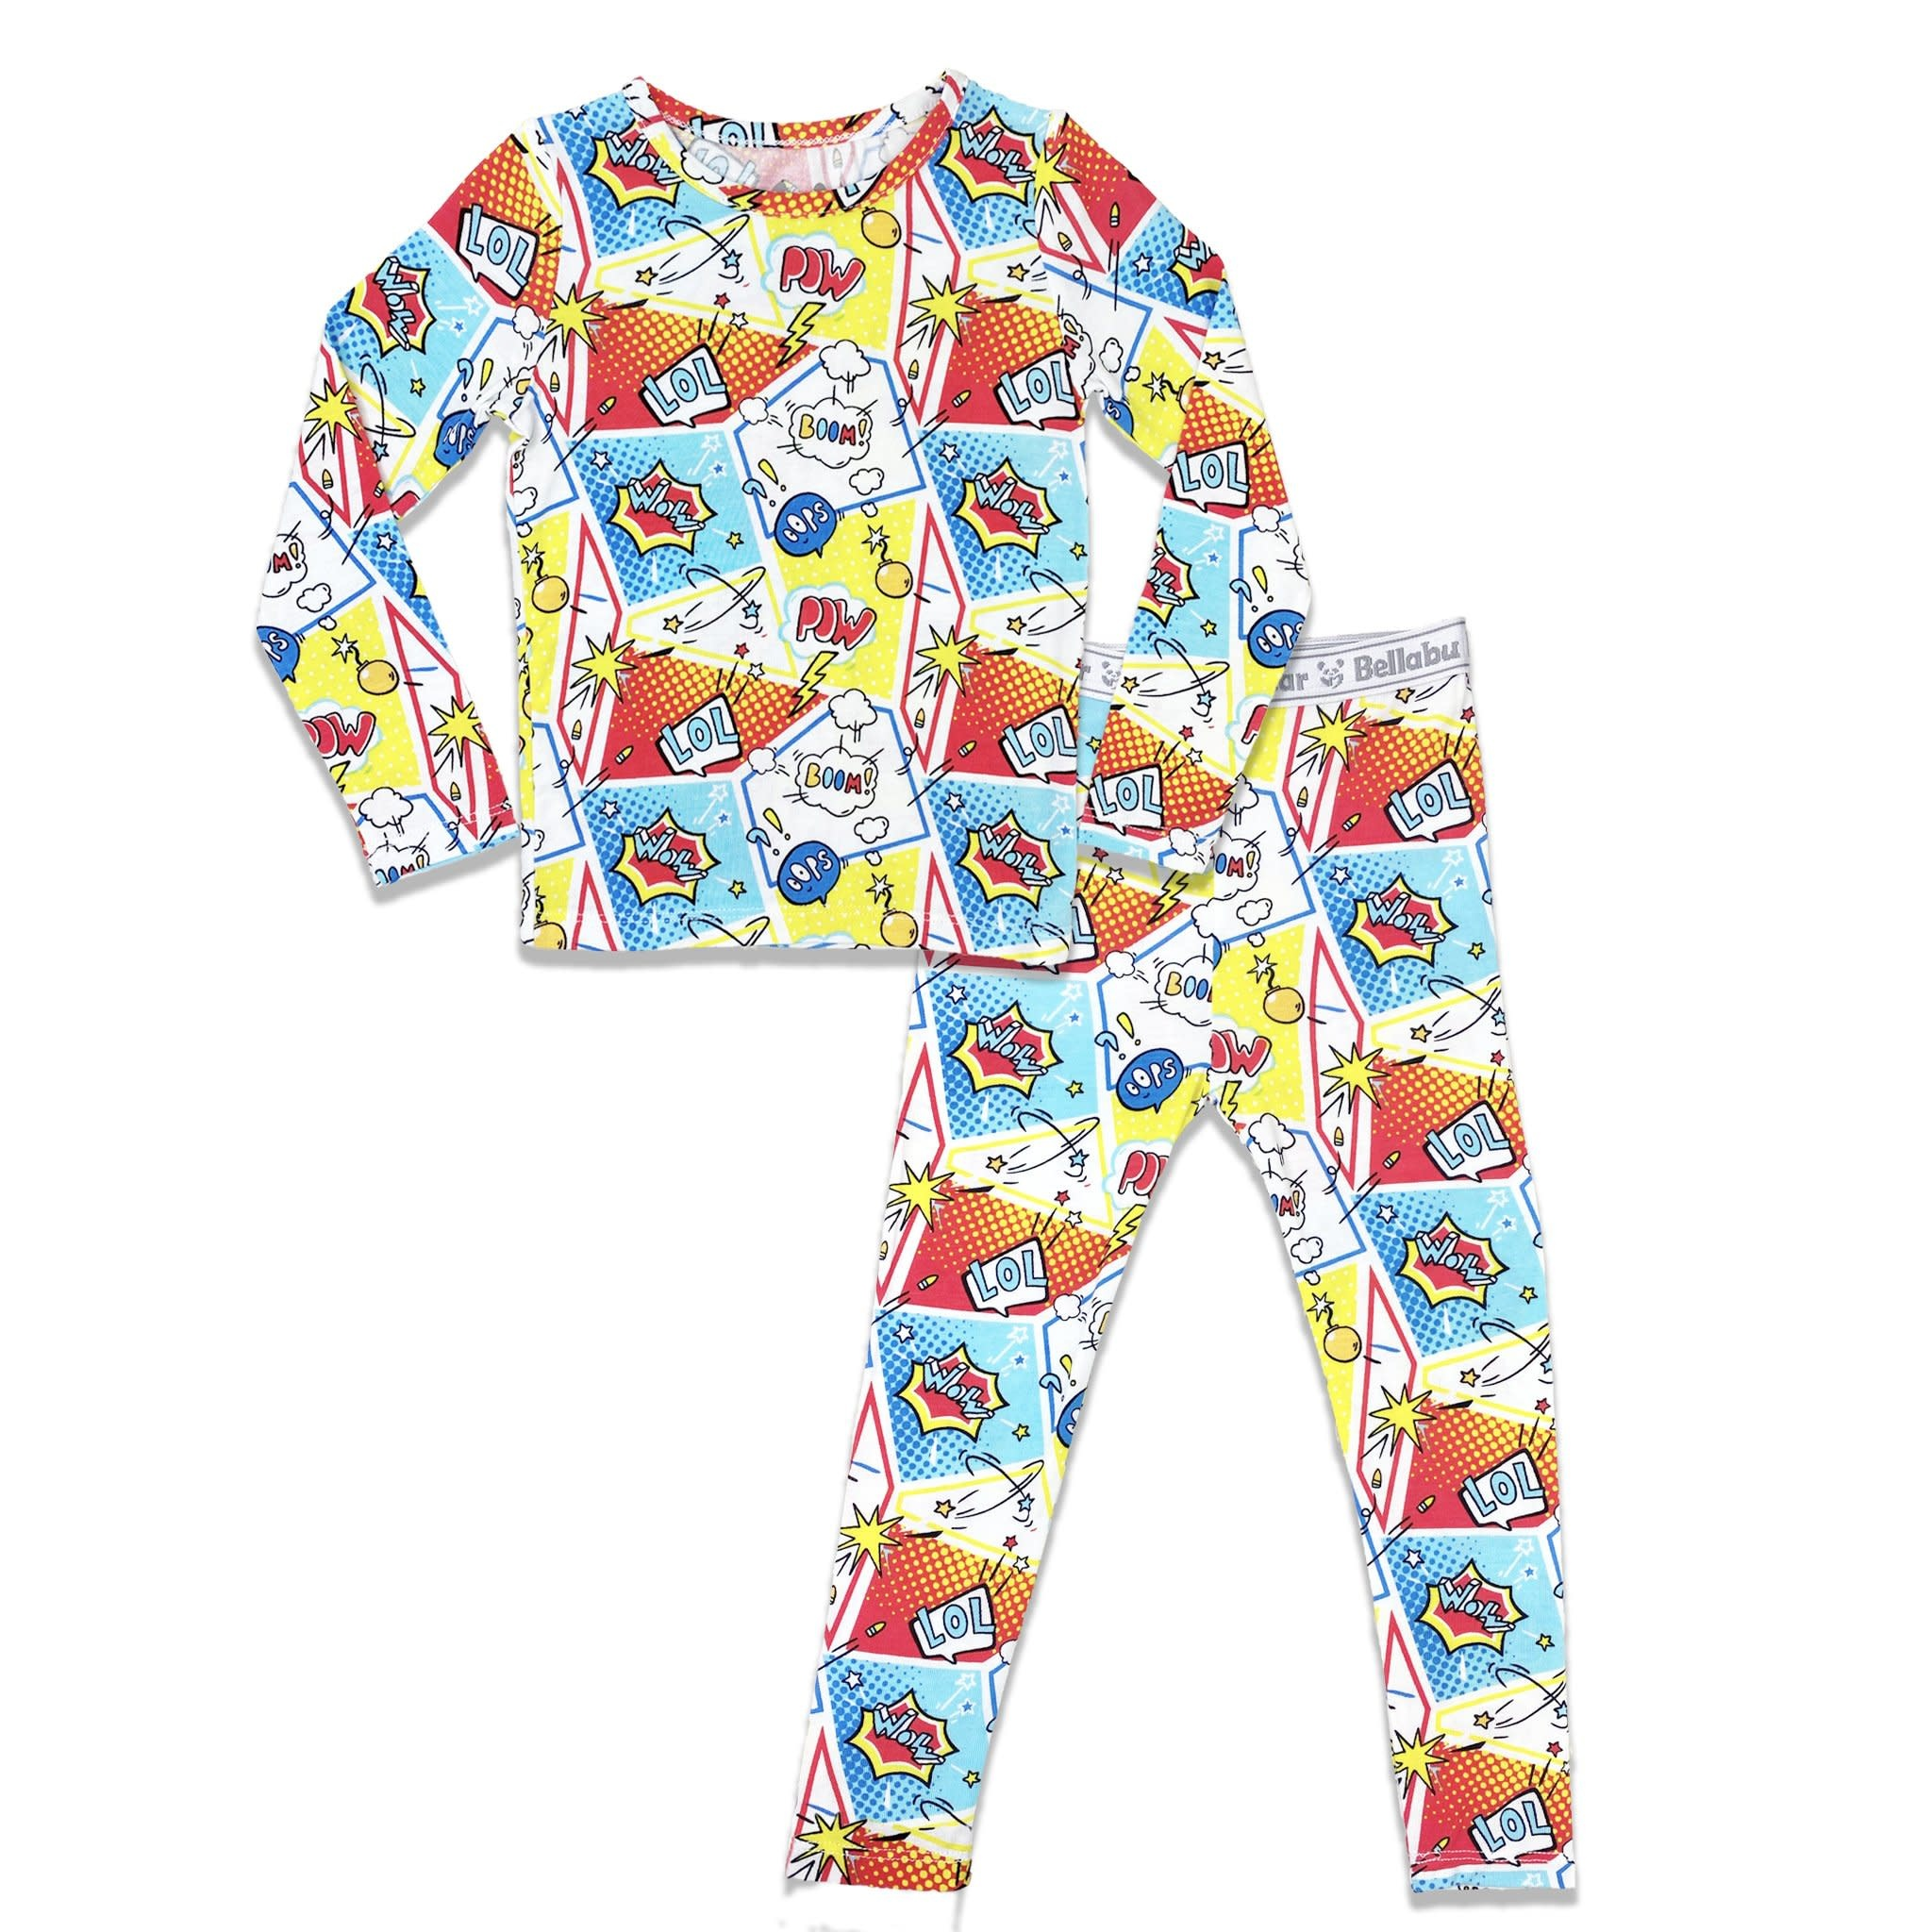 Bellabu Bear Bamboo Kids Pajamas